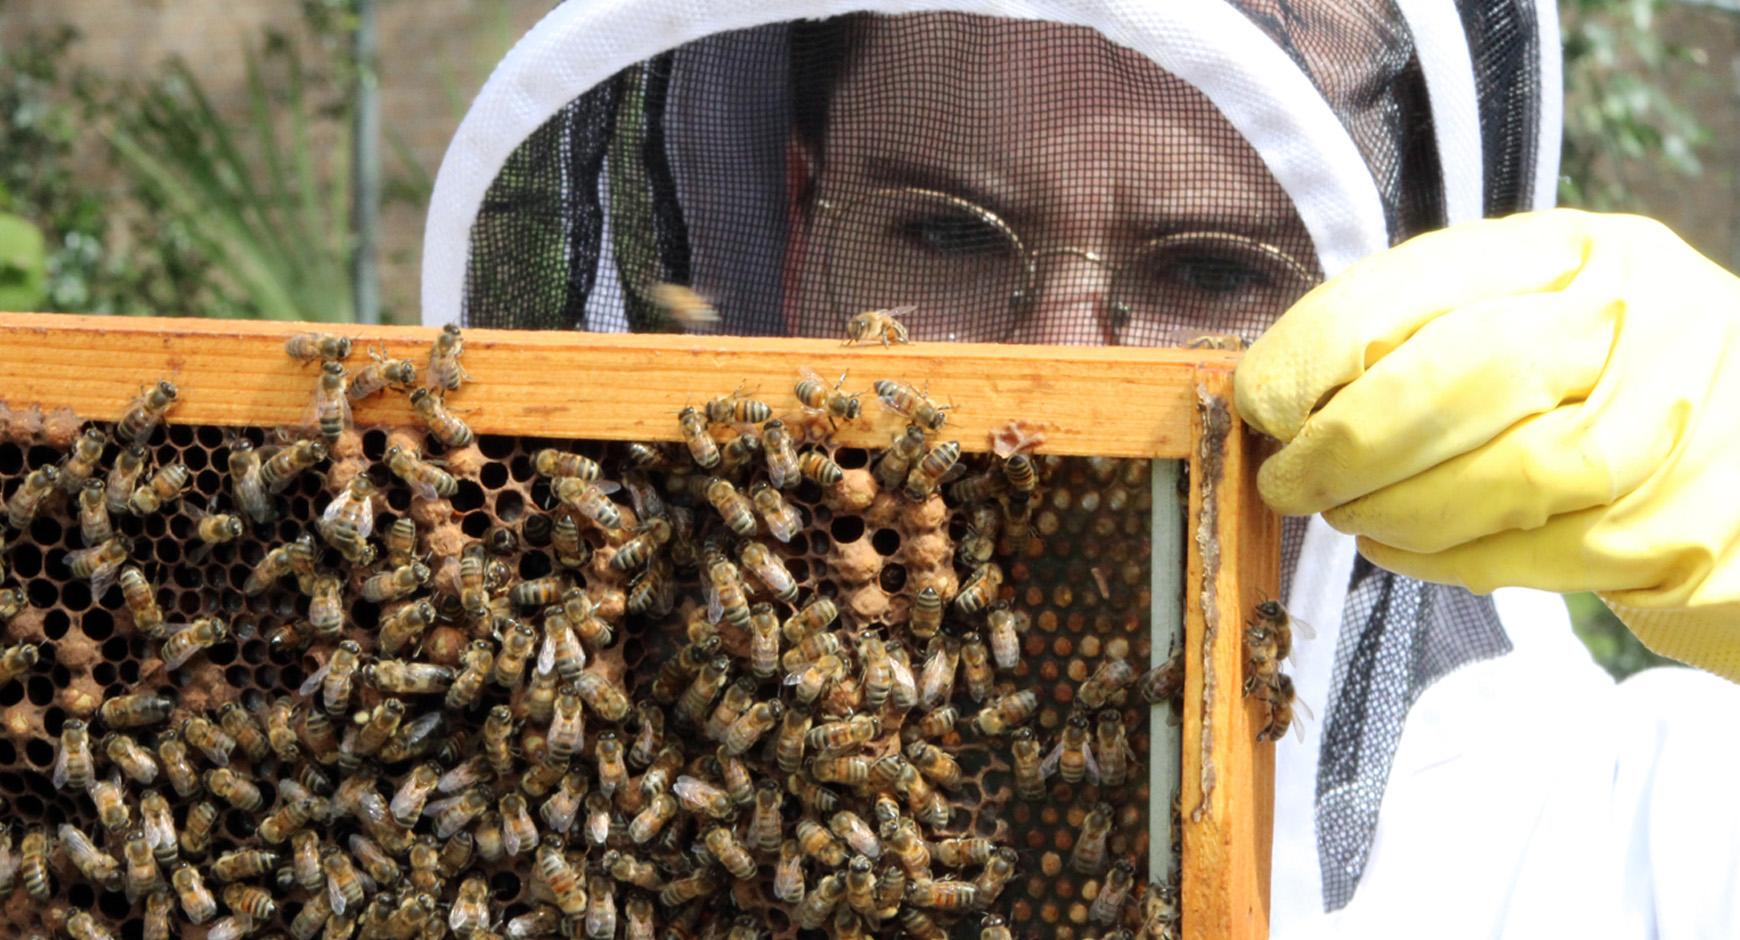 Beevo Beekeeping Society, University of Texas at Austin